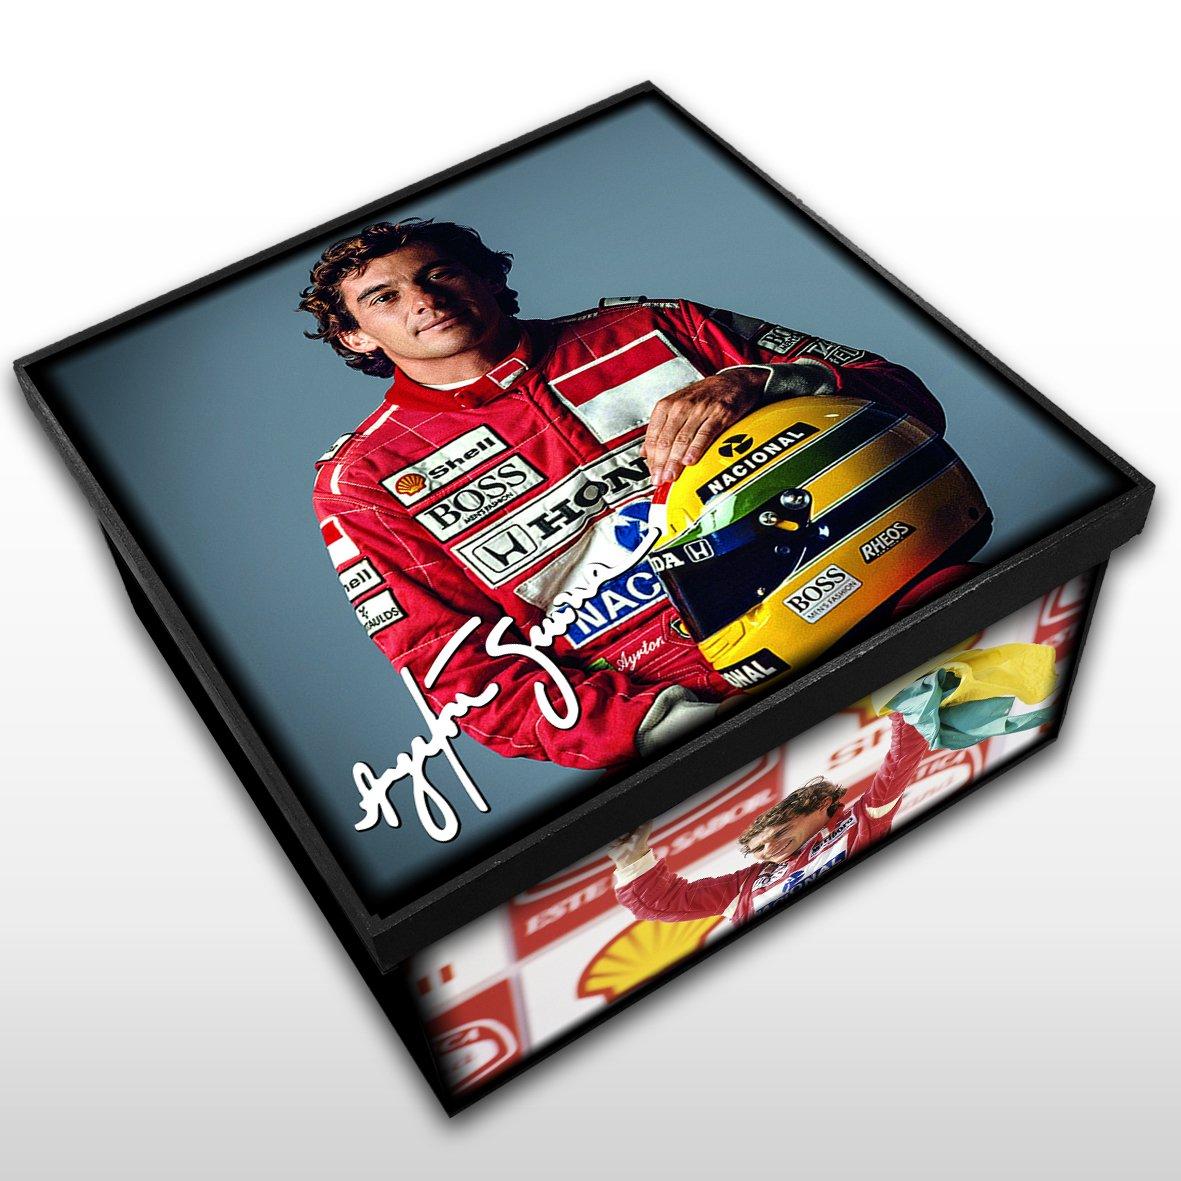 Ayrton Senna - Caixa em MDF - Tam. Médio - Mr. Rock